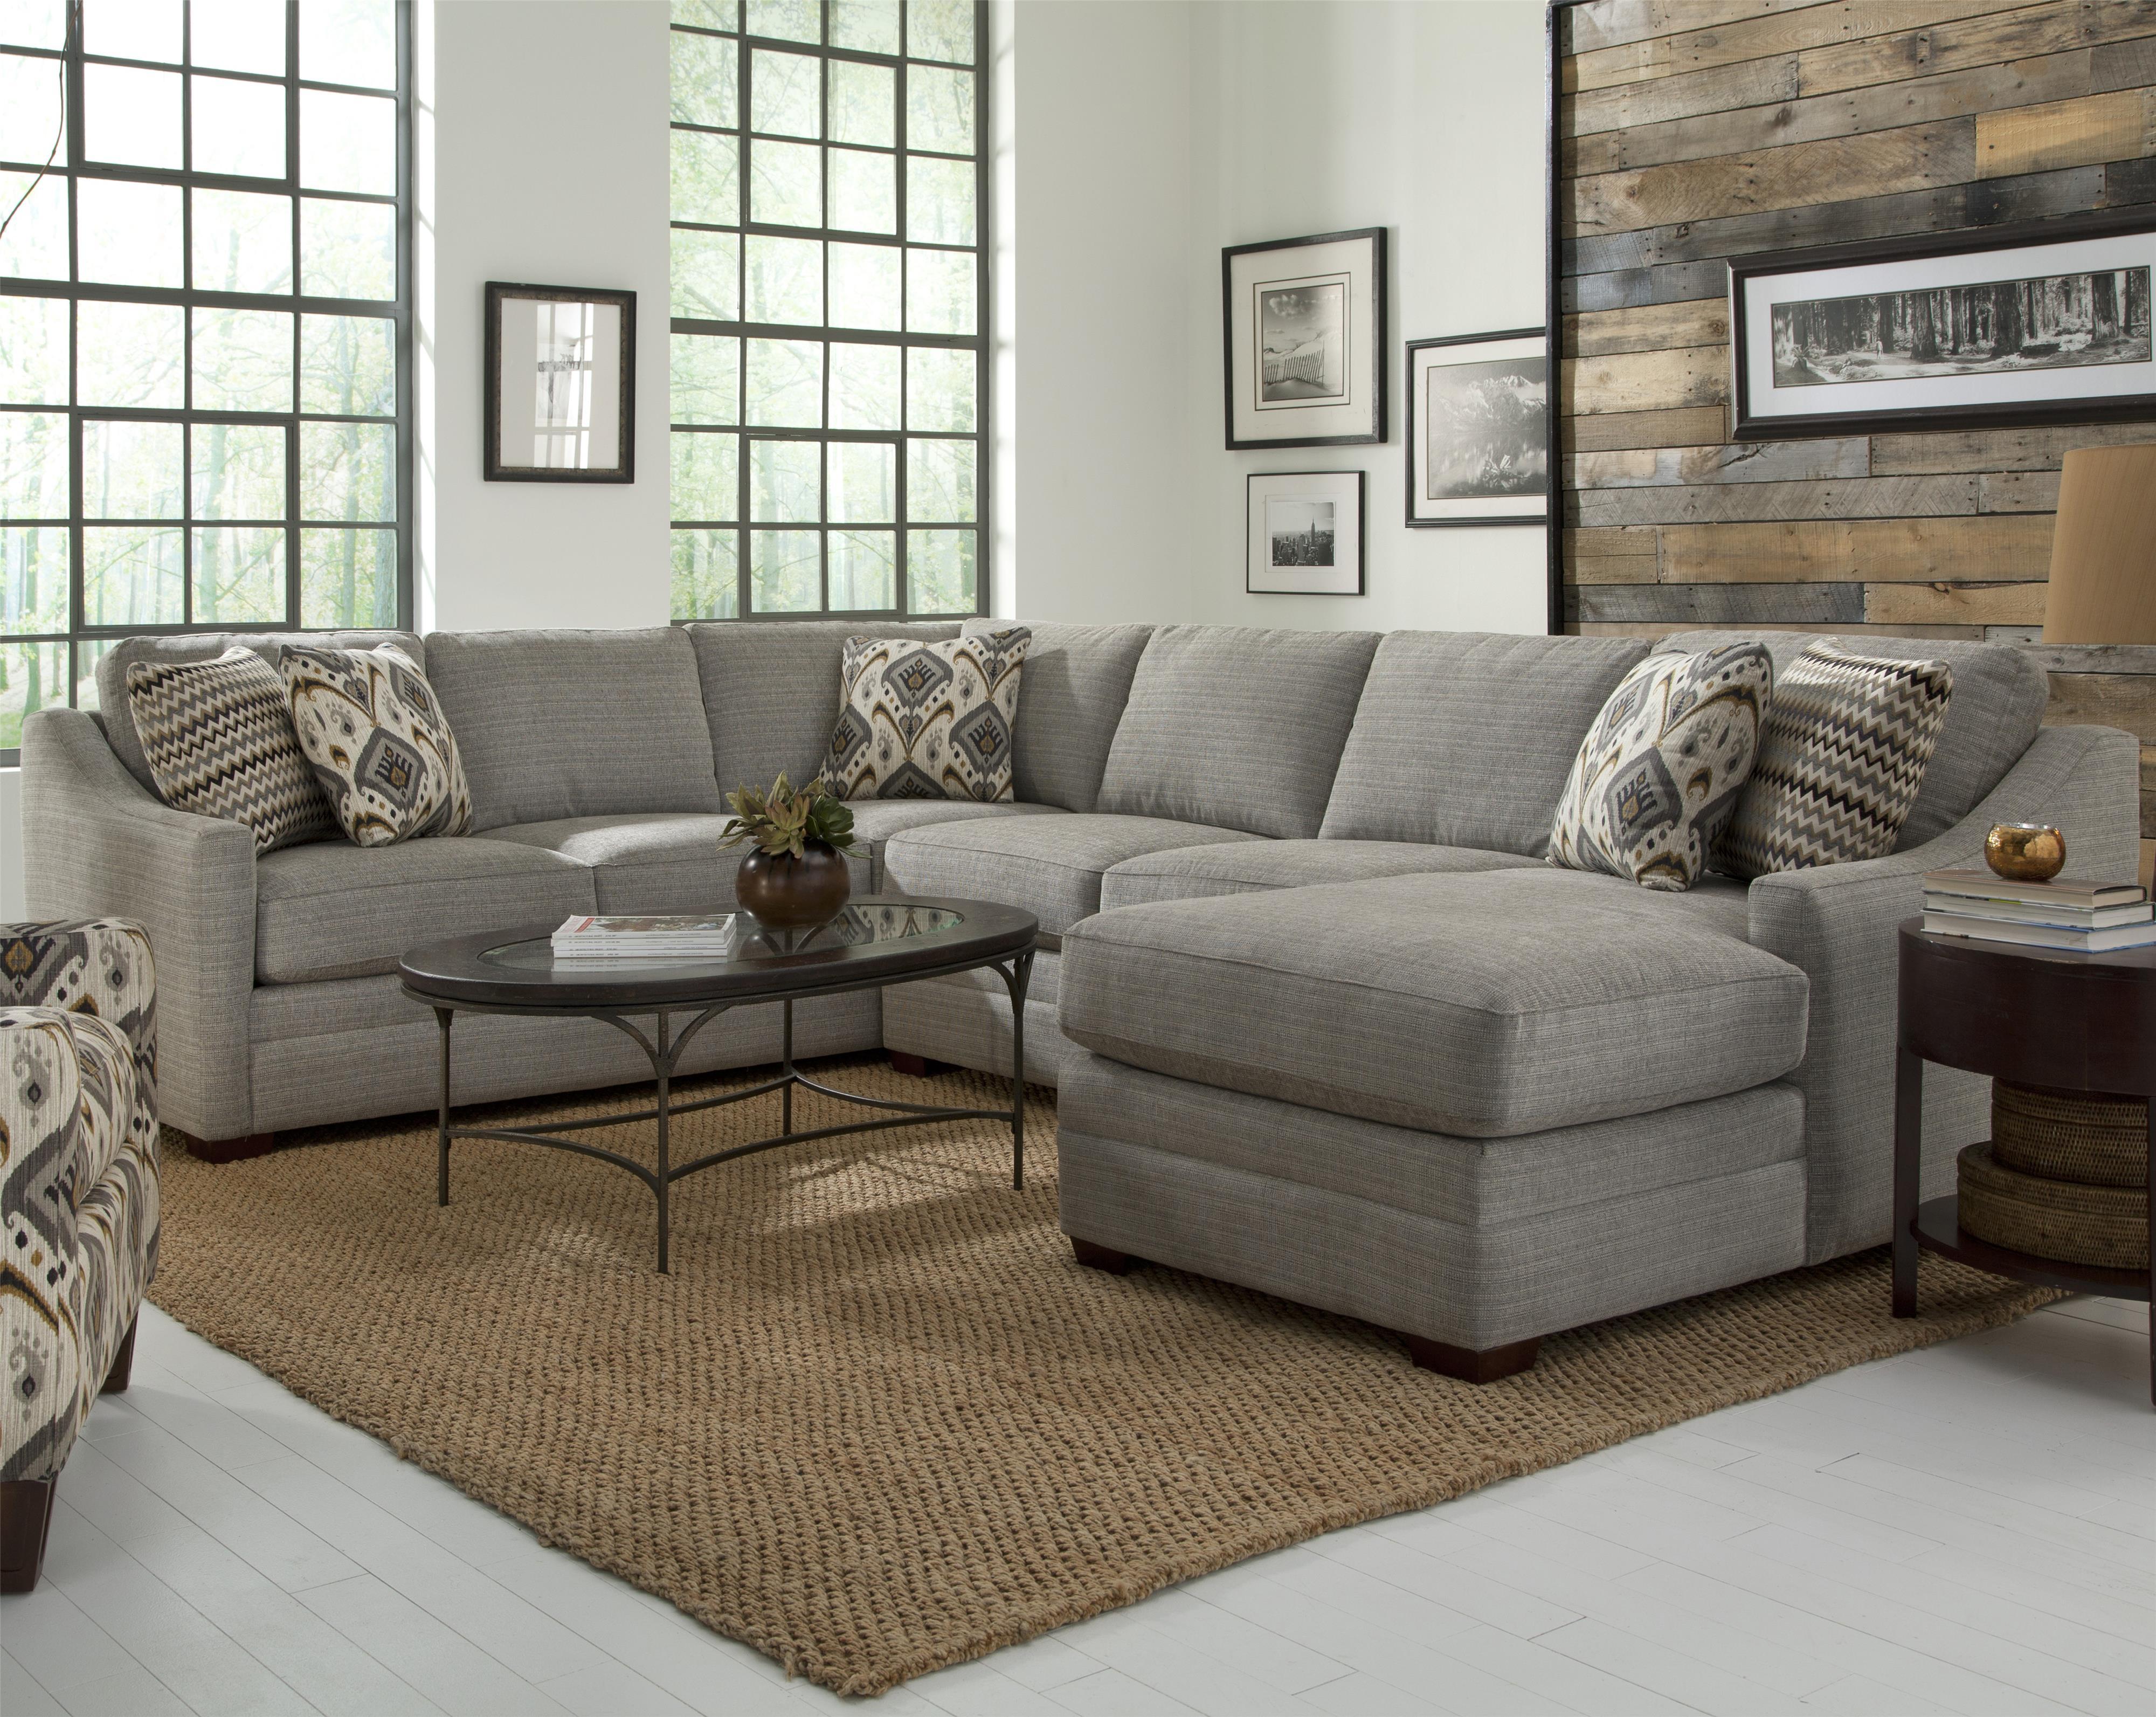 custom sectional sofa steel set coimbatore craftmaster f9 collection customizable four piece